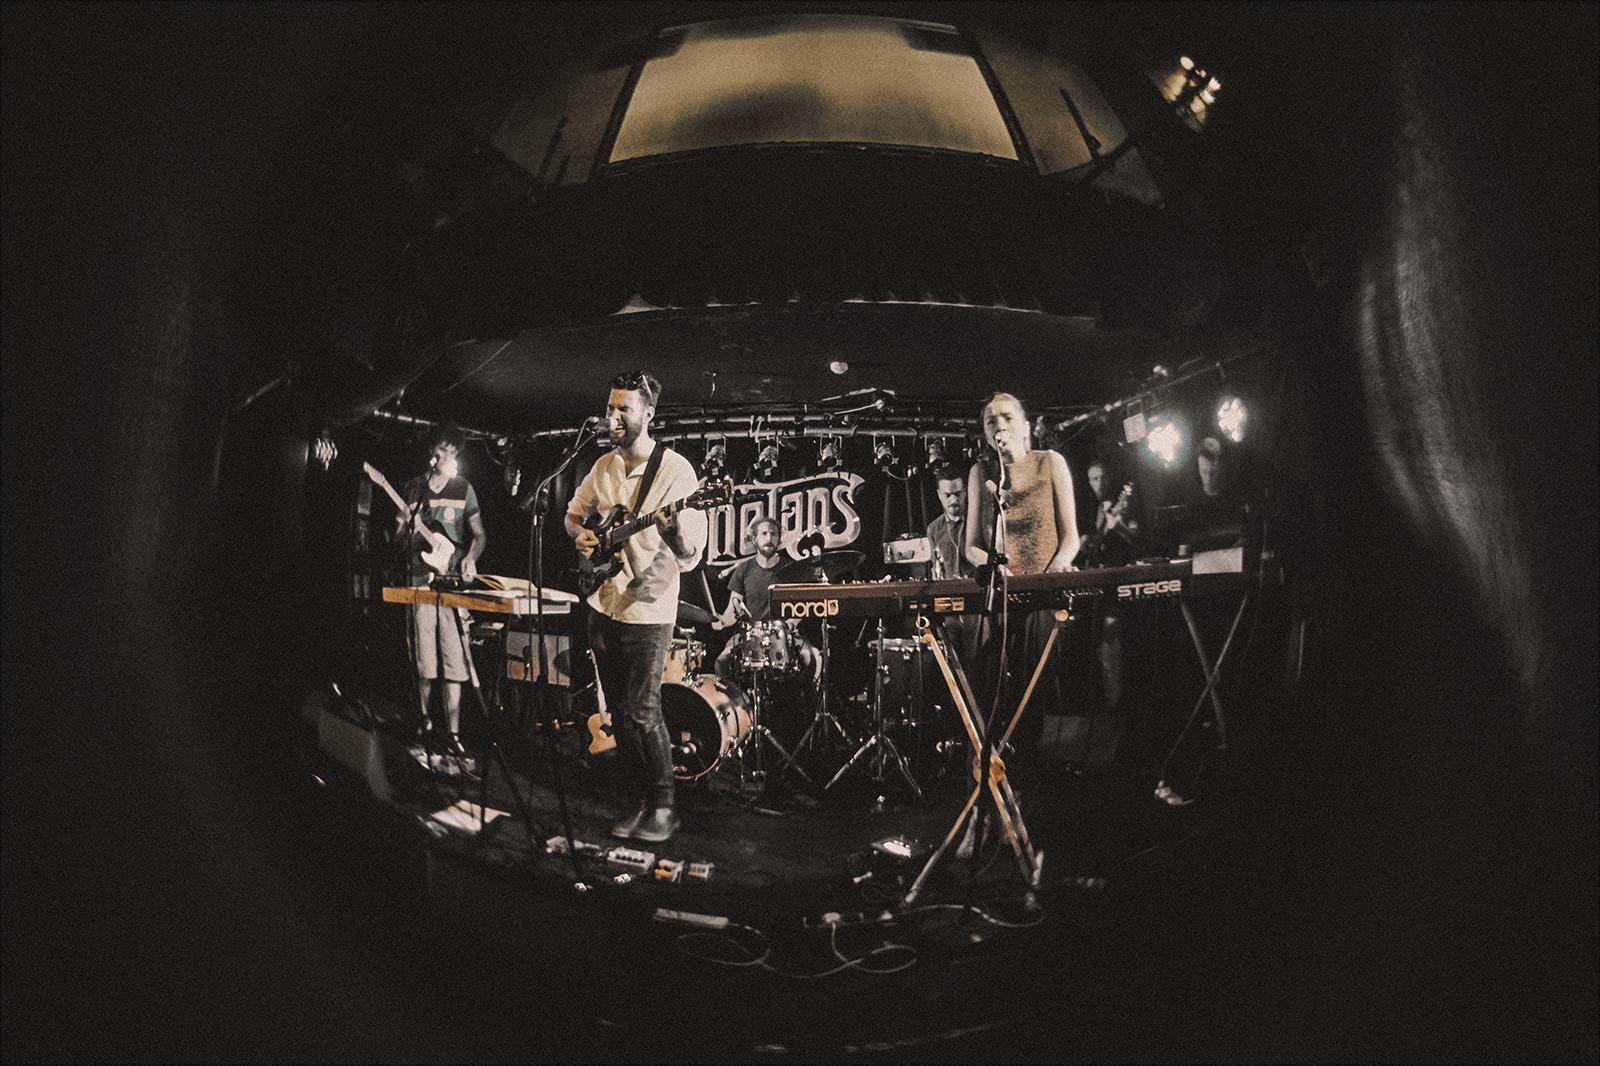 come_on_live_long_album_launch_whelans_dublin017.jpg